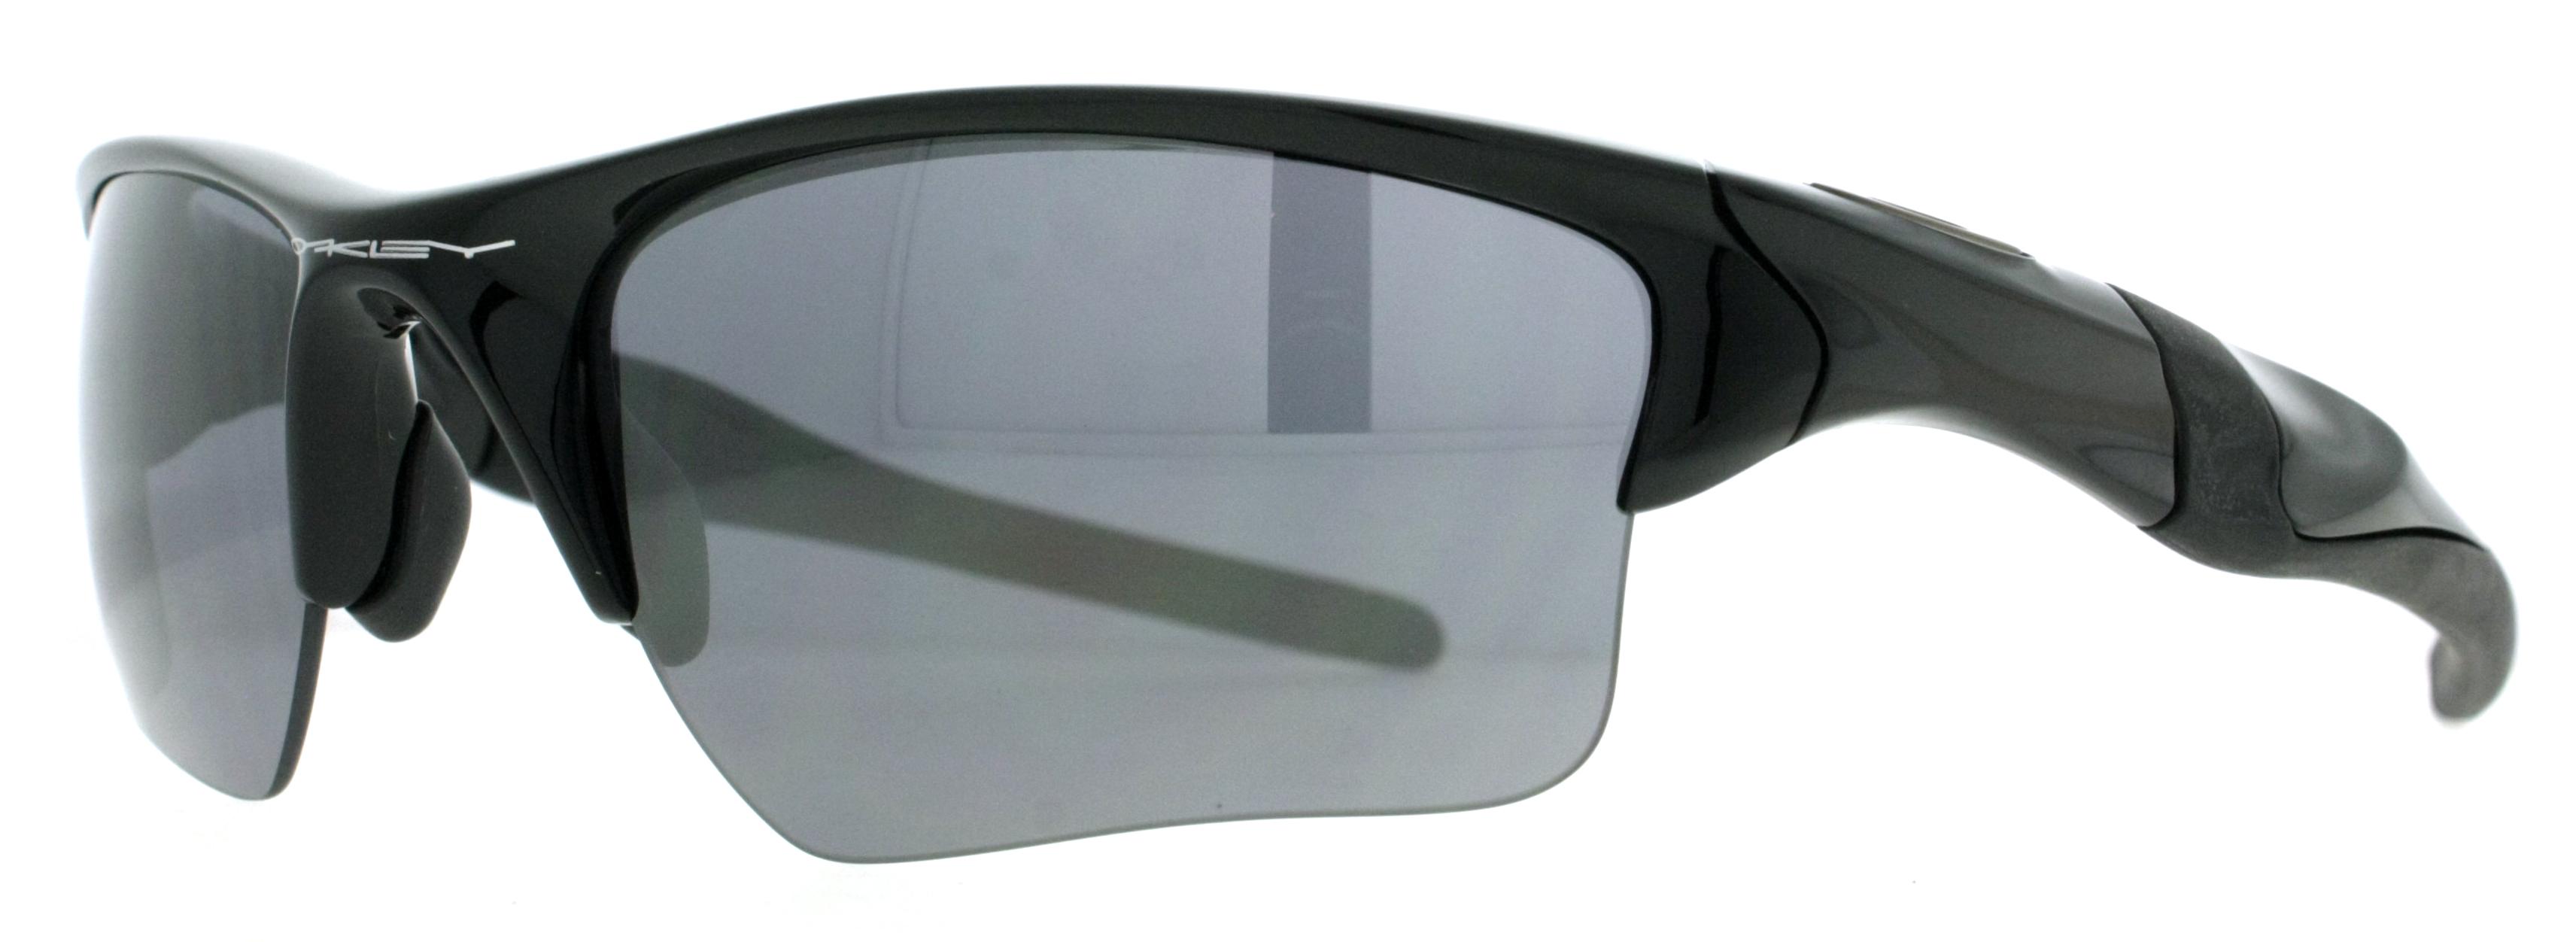 Oakley Half Jacket Si 3 Array Sunglasses « Heritage Malta 98ddc88e2ea3